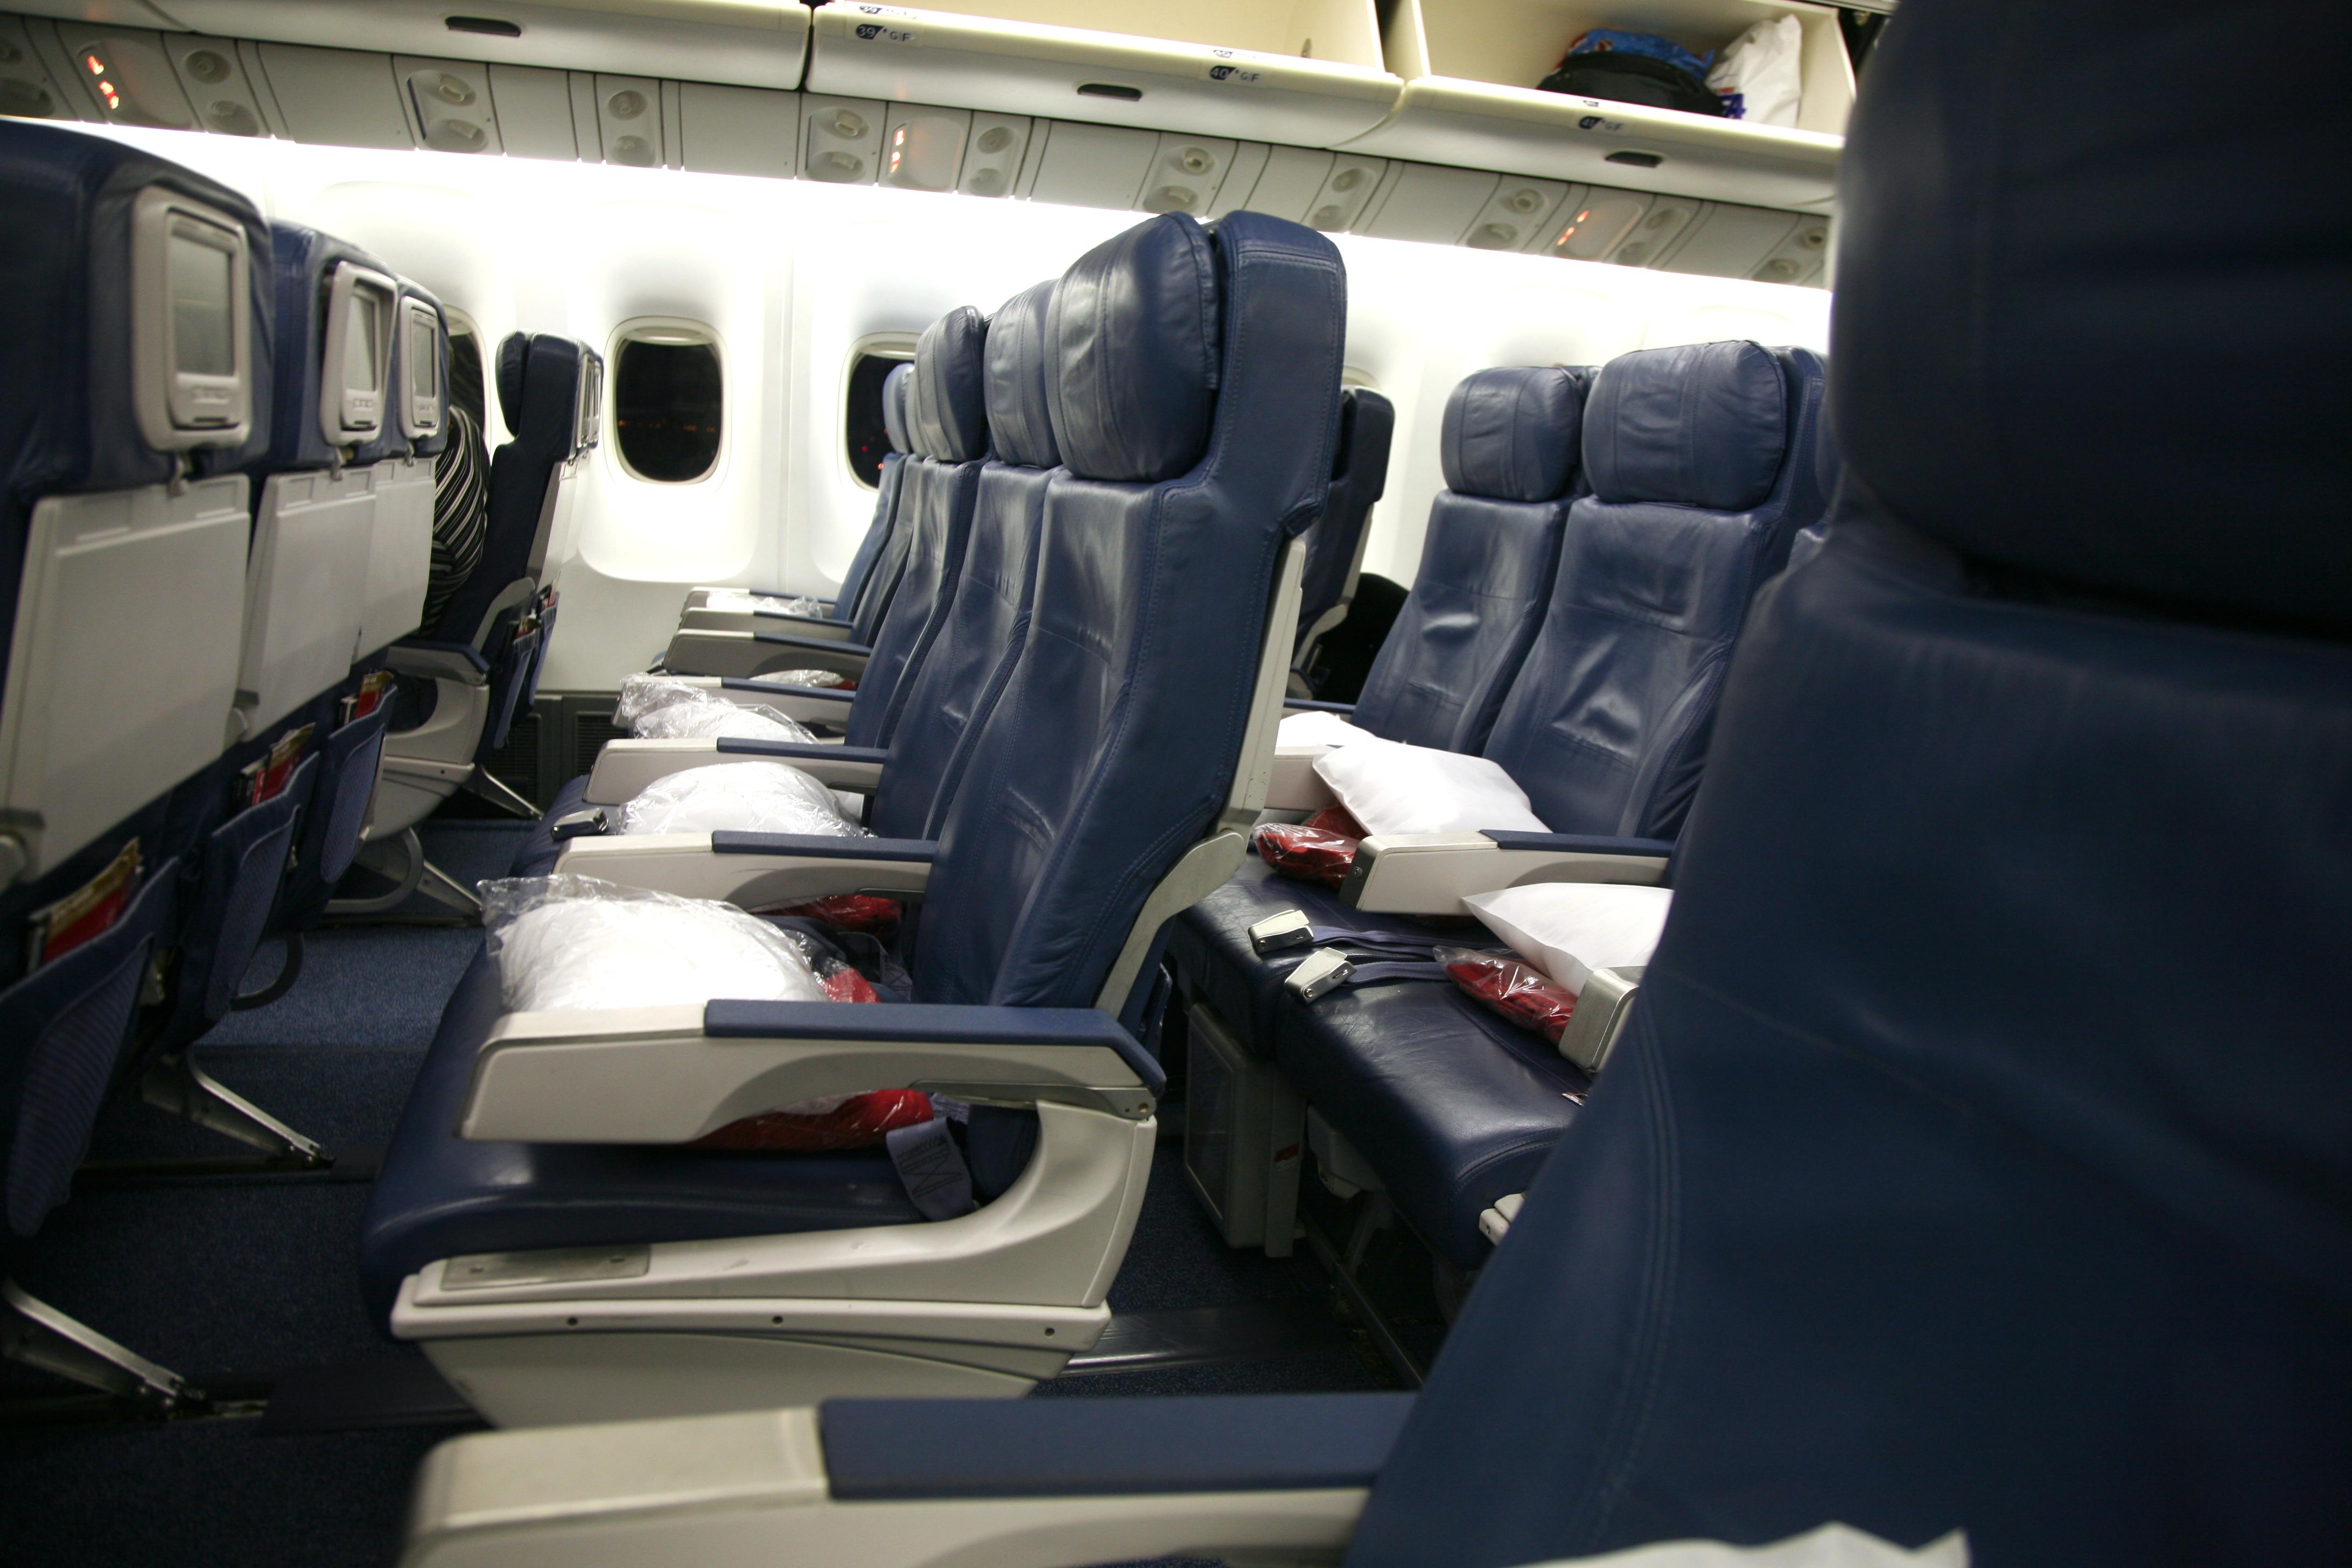 Free Images : car, van, plane, airline, aviation, piano, craft, public transport, avion, plan ...